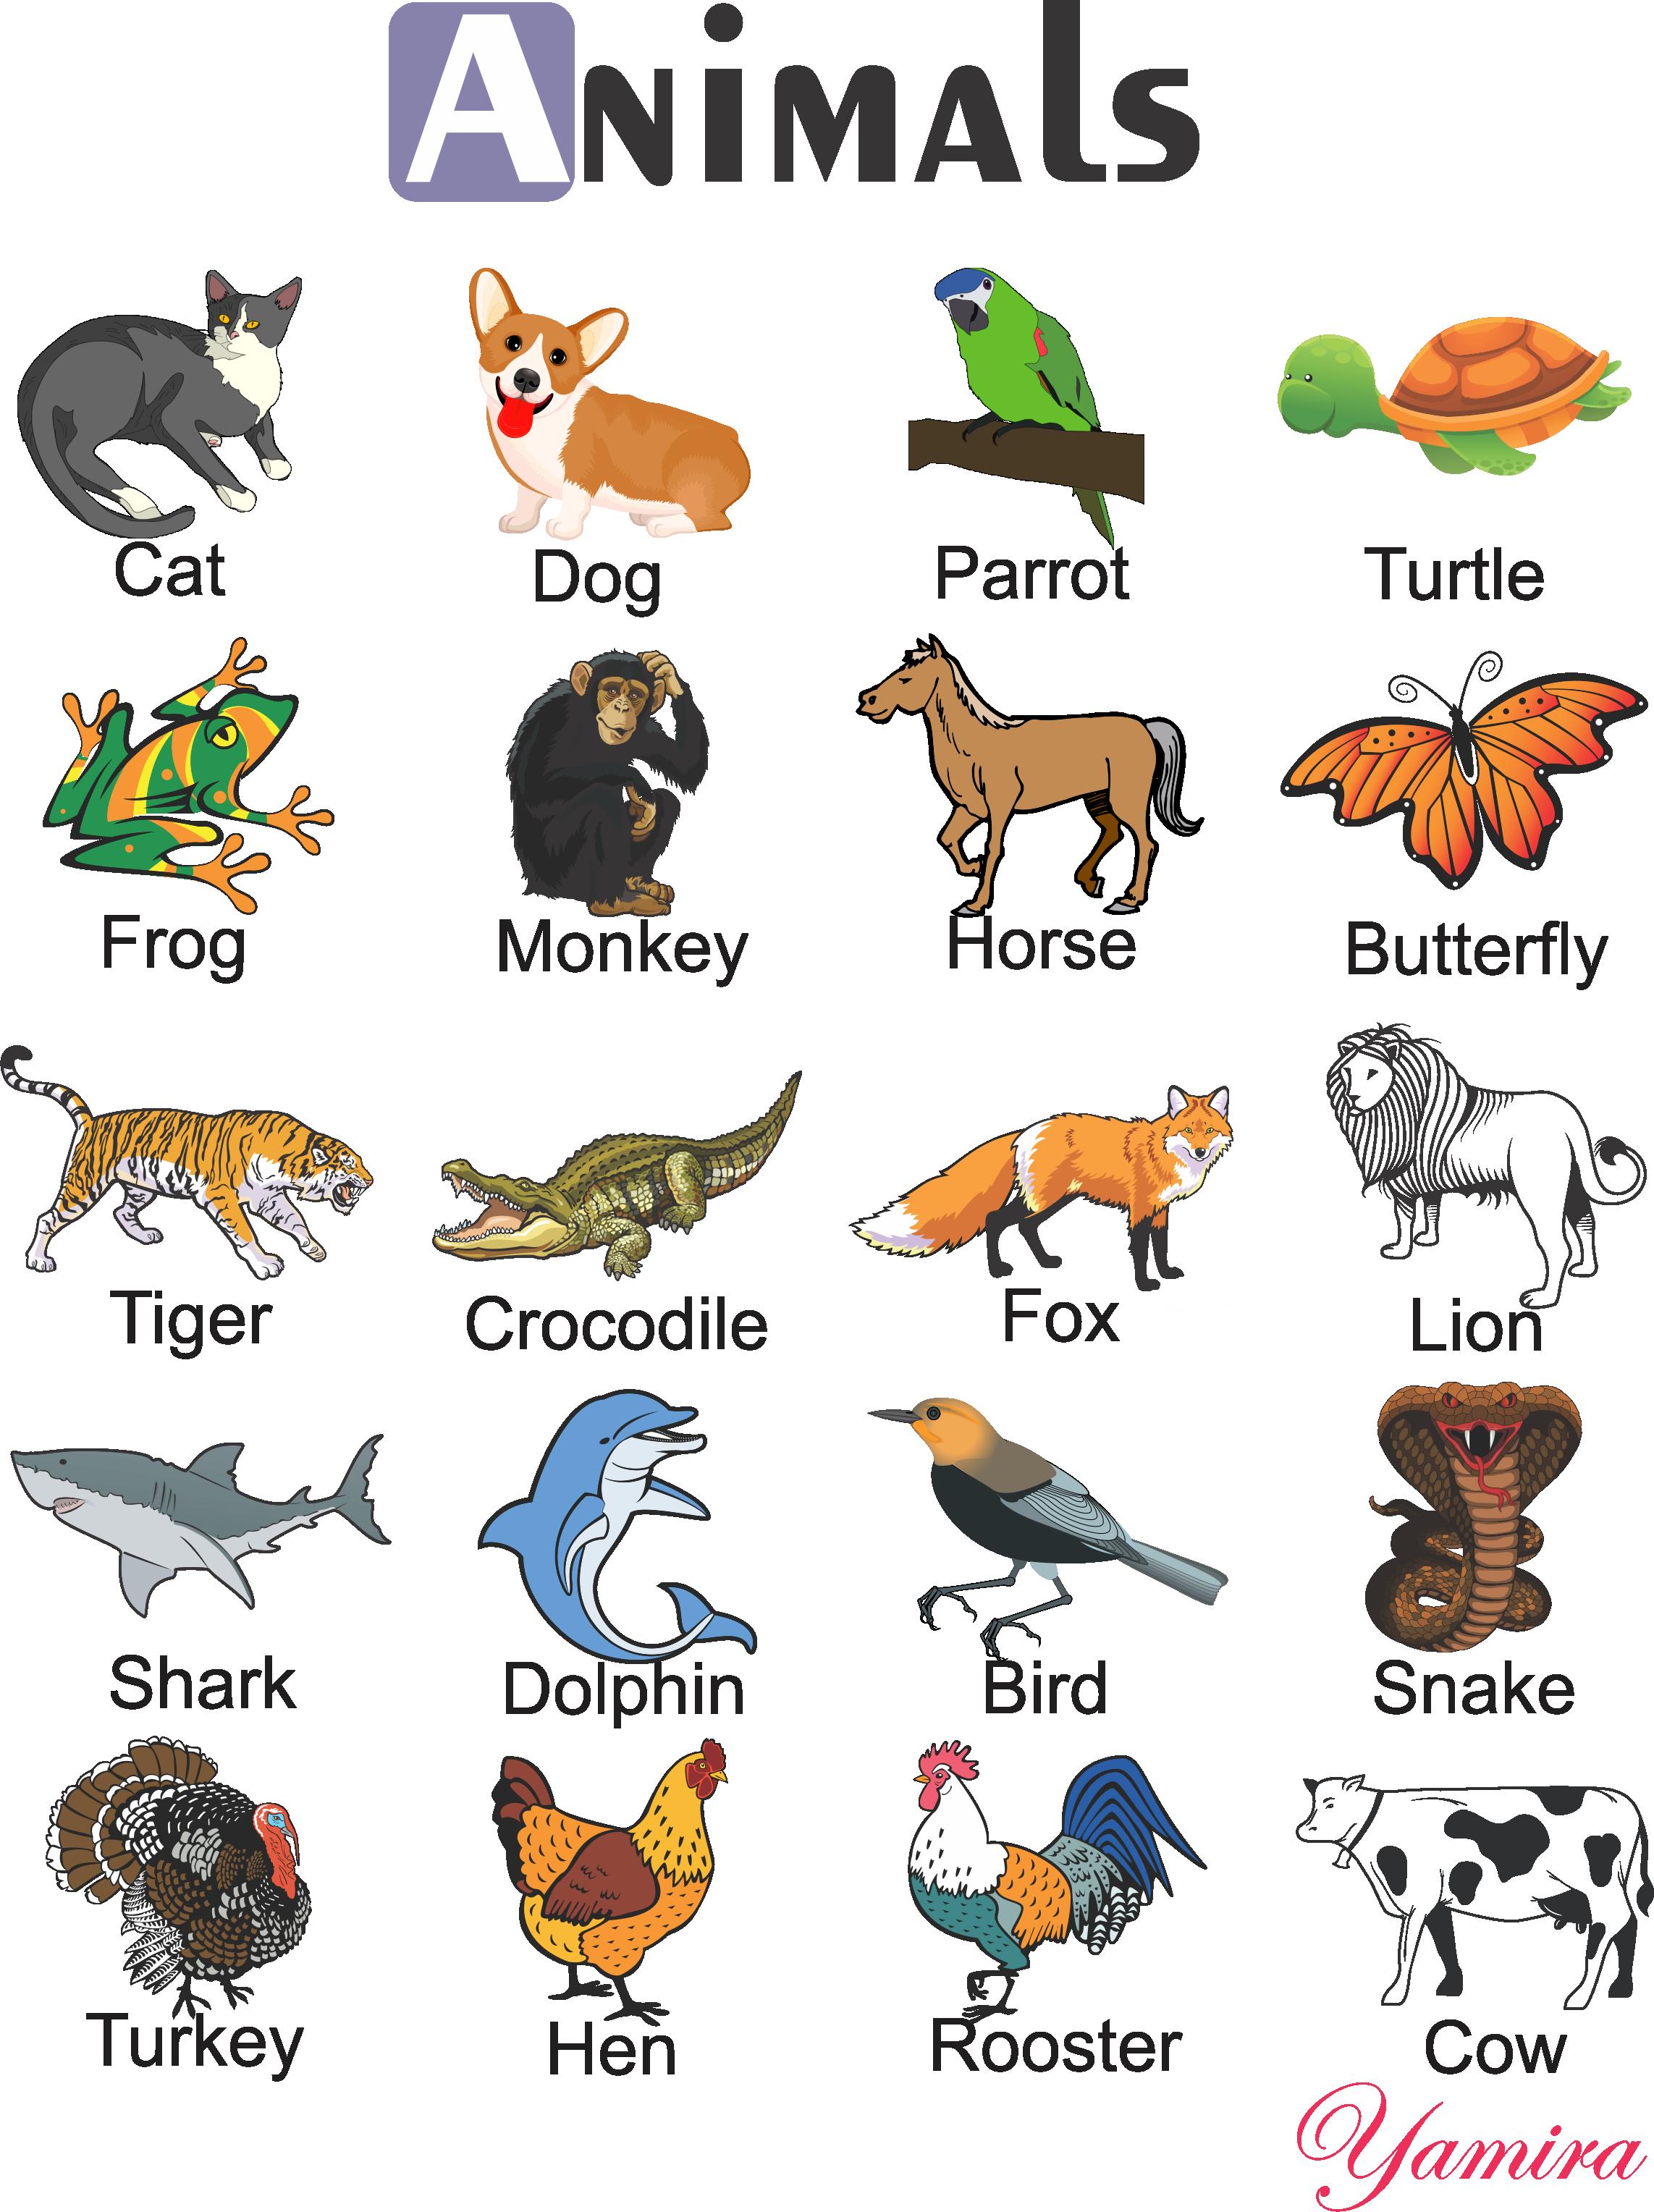 Картинки животных с названием по английски